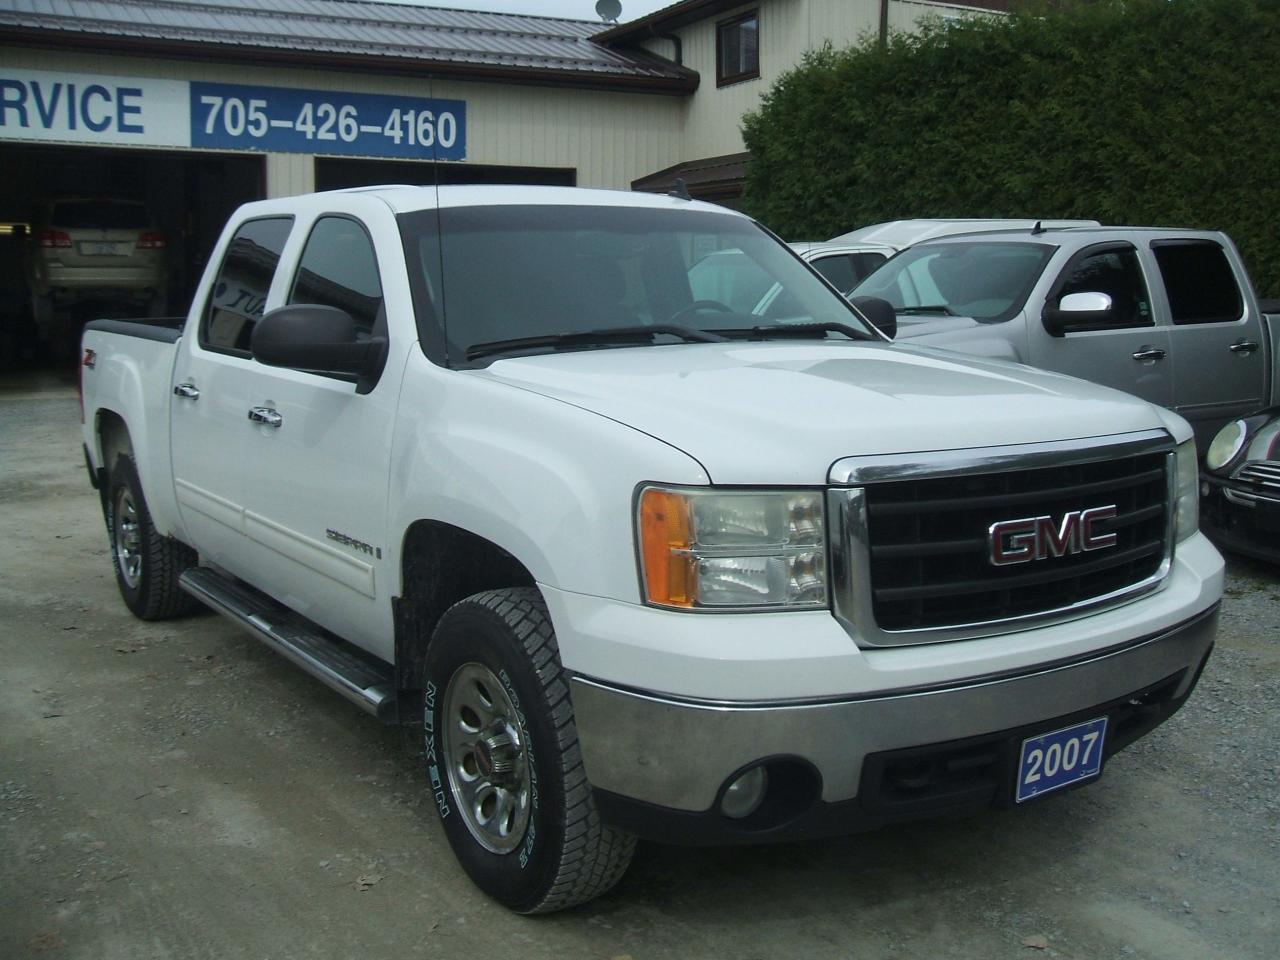 Photo of White 2007 GMC Sierra 1500